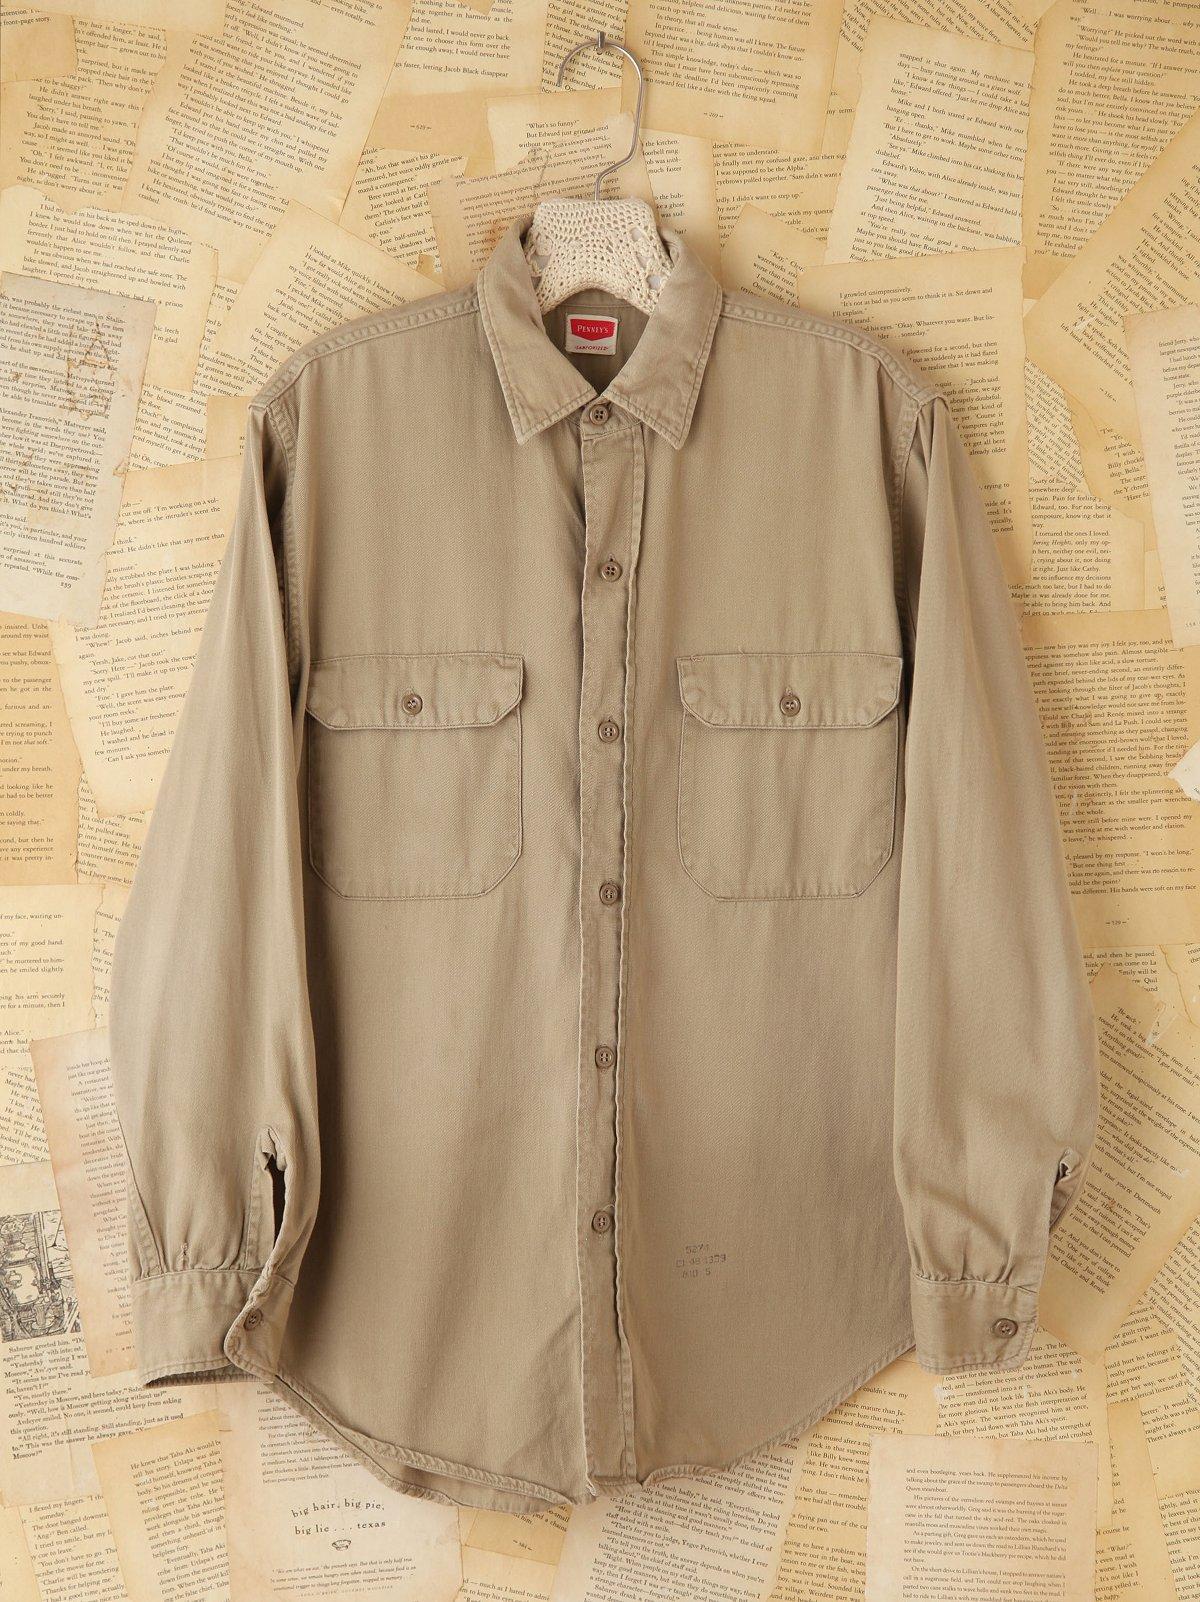 Vintage Military Buttondown Shirt